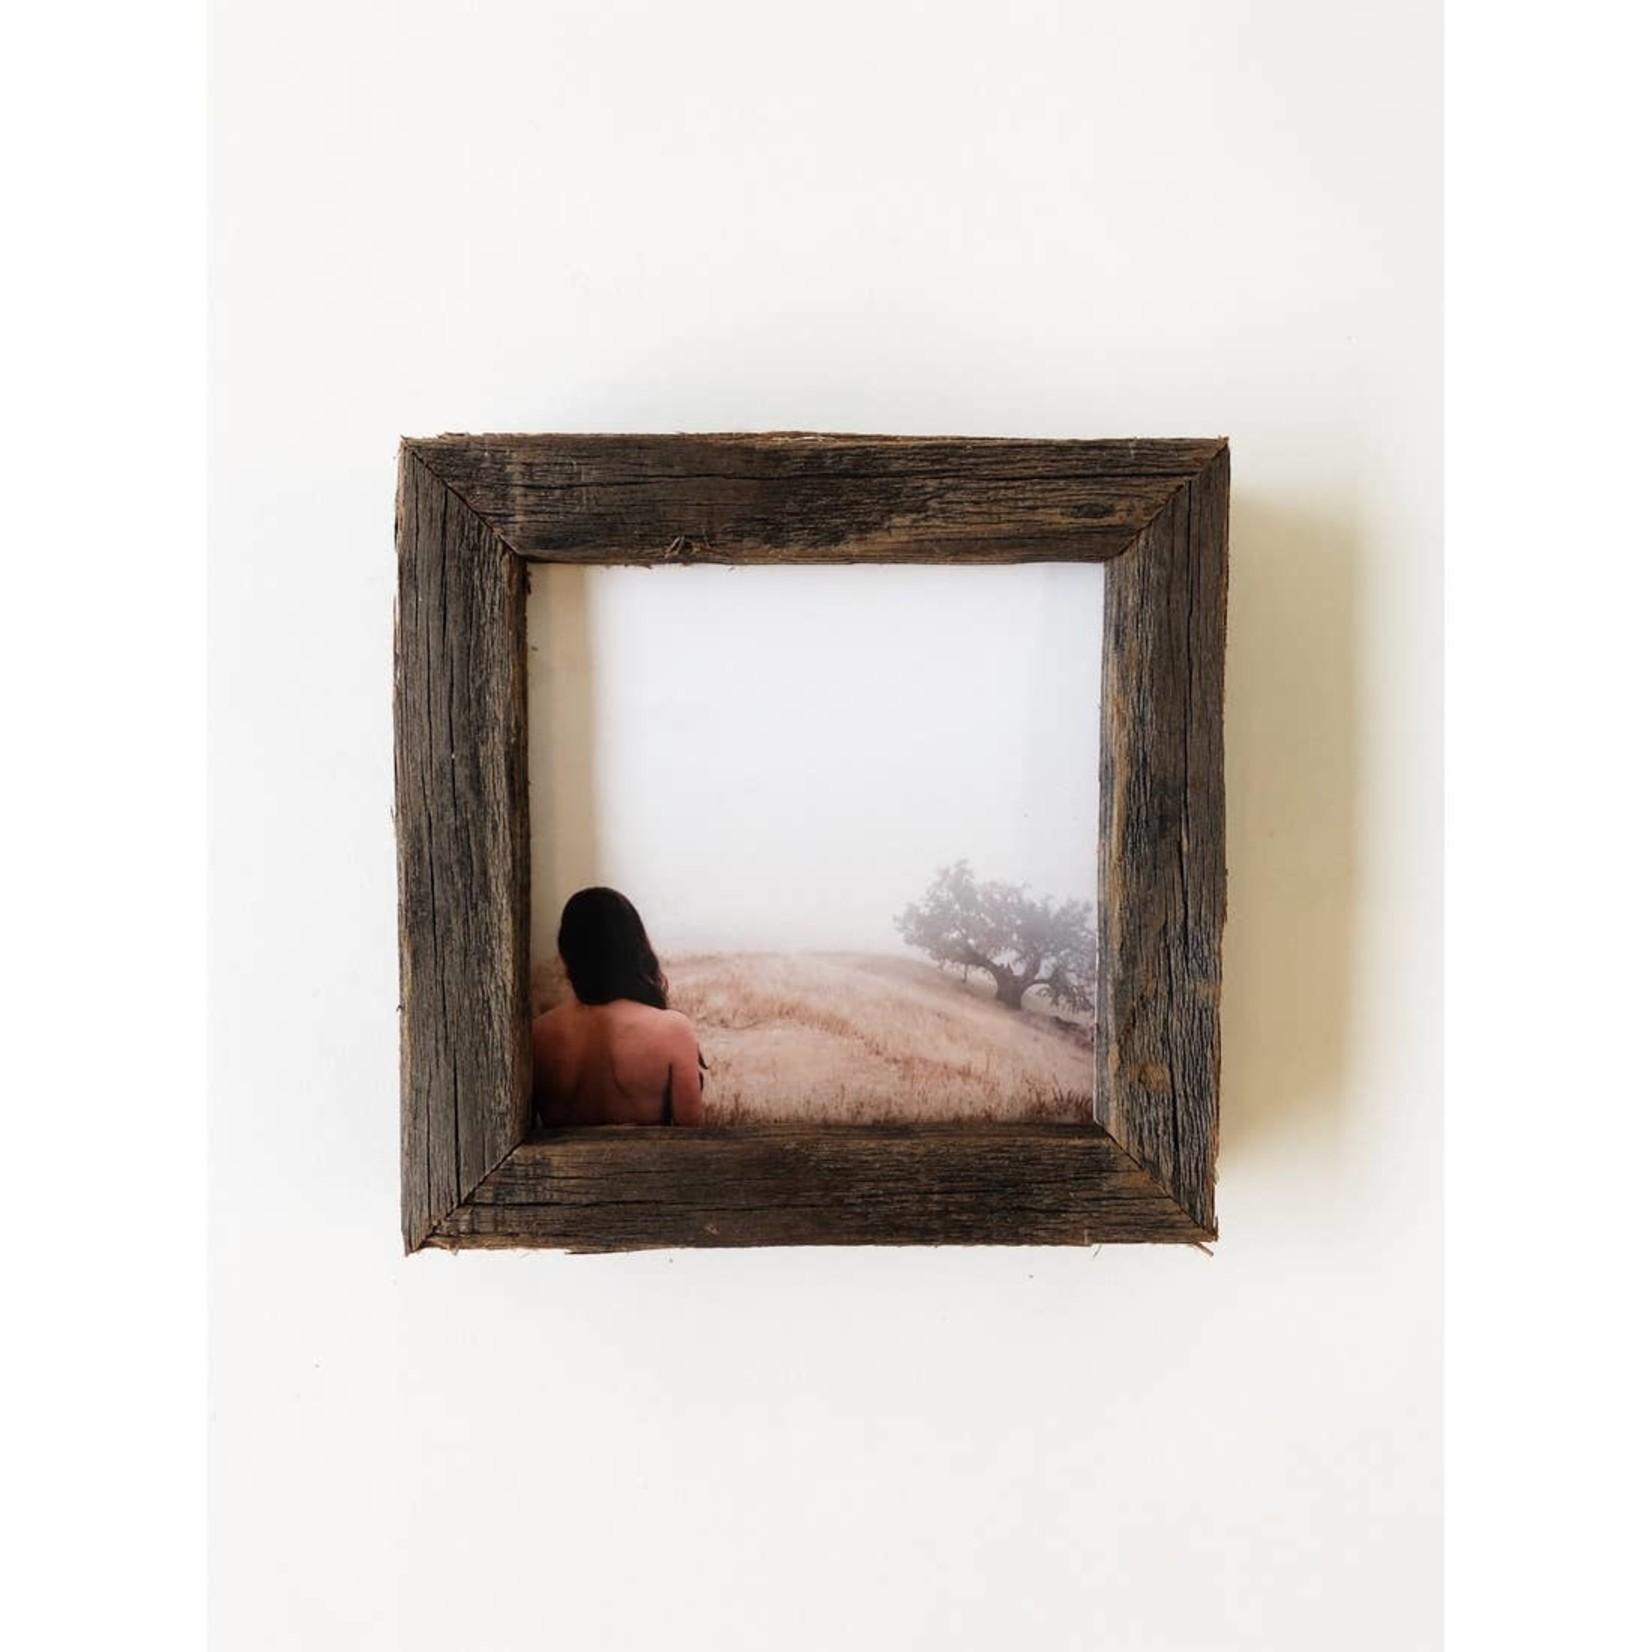 Alibi Interiors Alibi Reclaimed Wood Gallery Frame 4x4